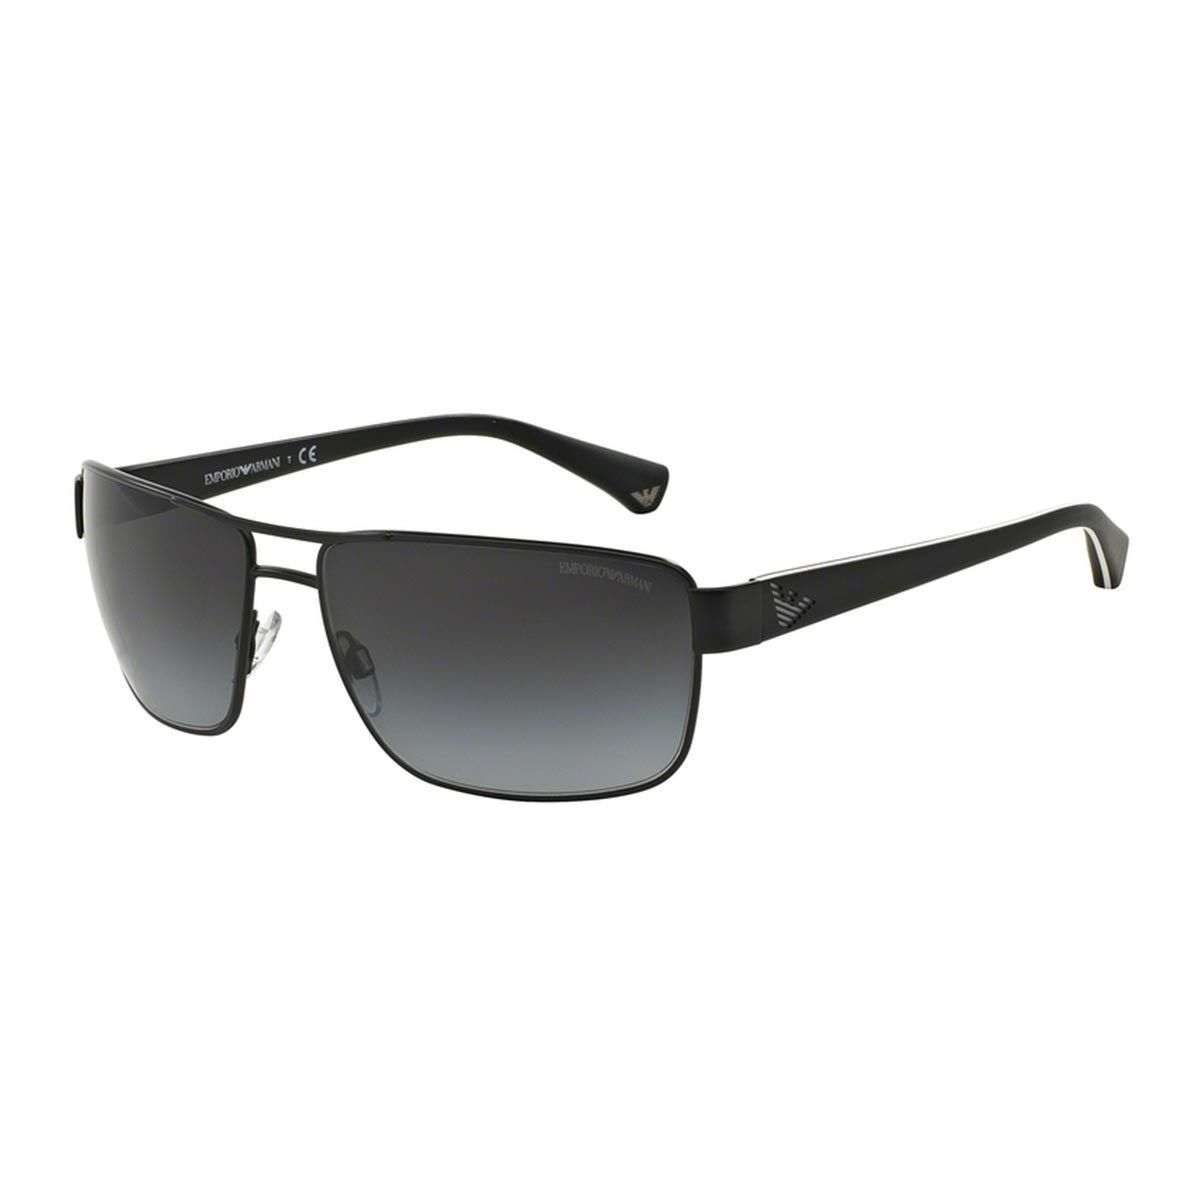 f1902ee17a59 Emporio Armani Men s Black Metal Rectangle Sunglasses by Emporio Armani